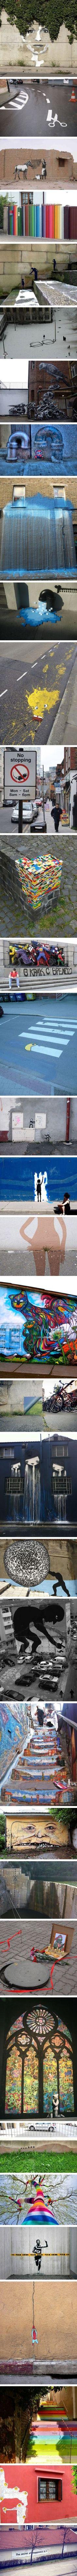 Arte callejera